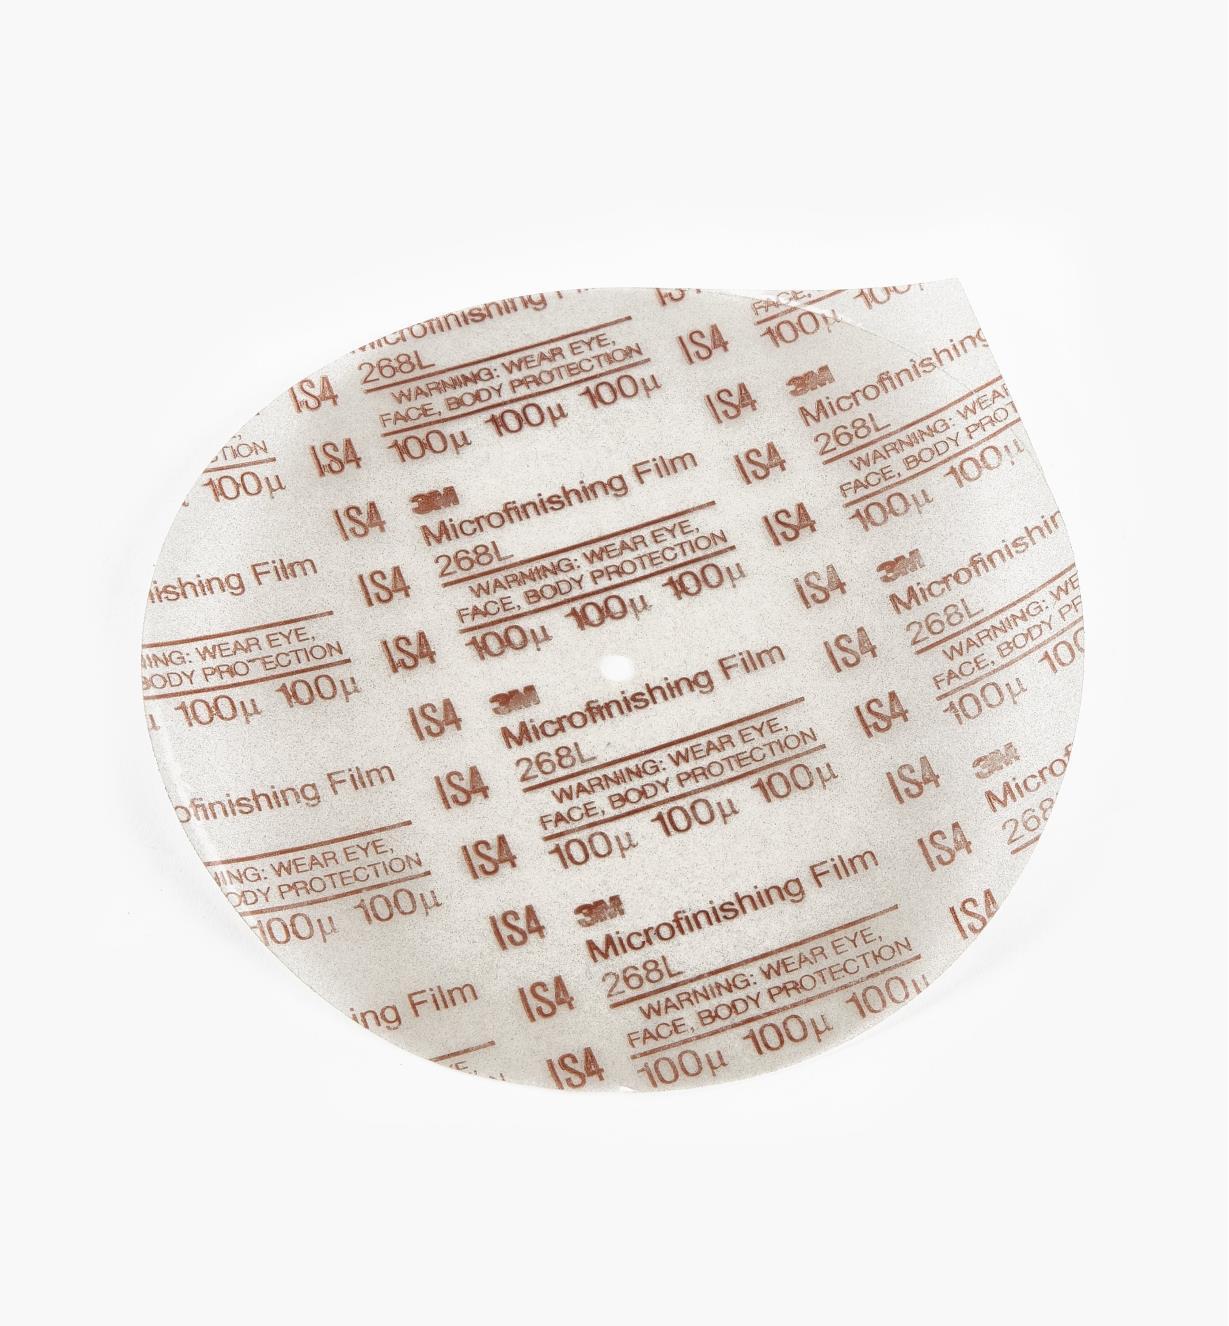 05M3020 - Disque en oxyde d'aluminium de 8po, grain150*